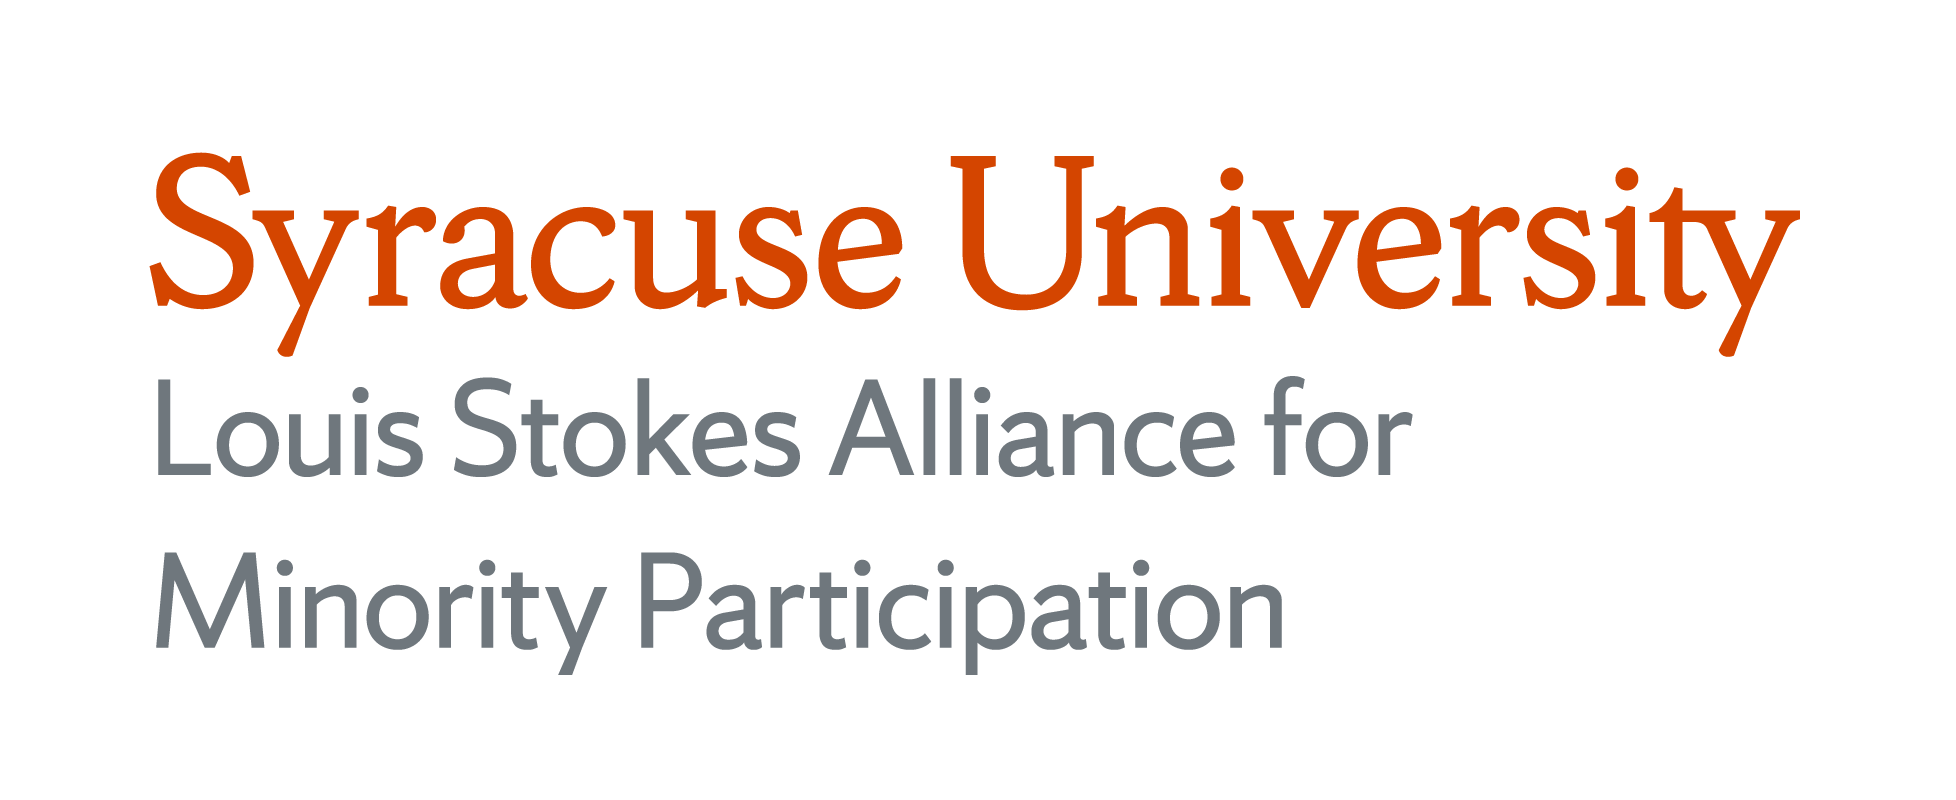 Syracuse University Louis Stokes Alliance for Minority Participation